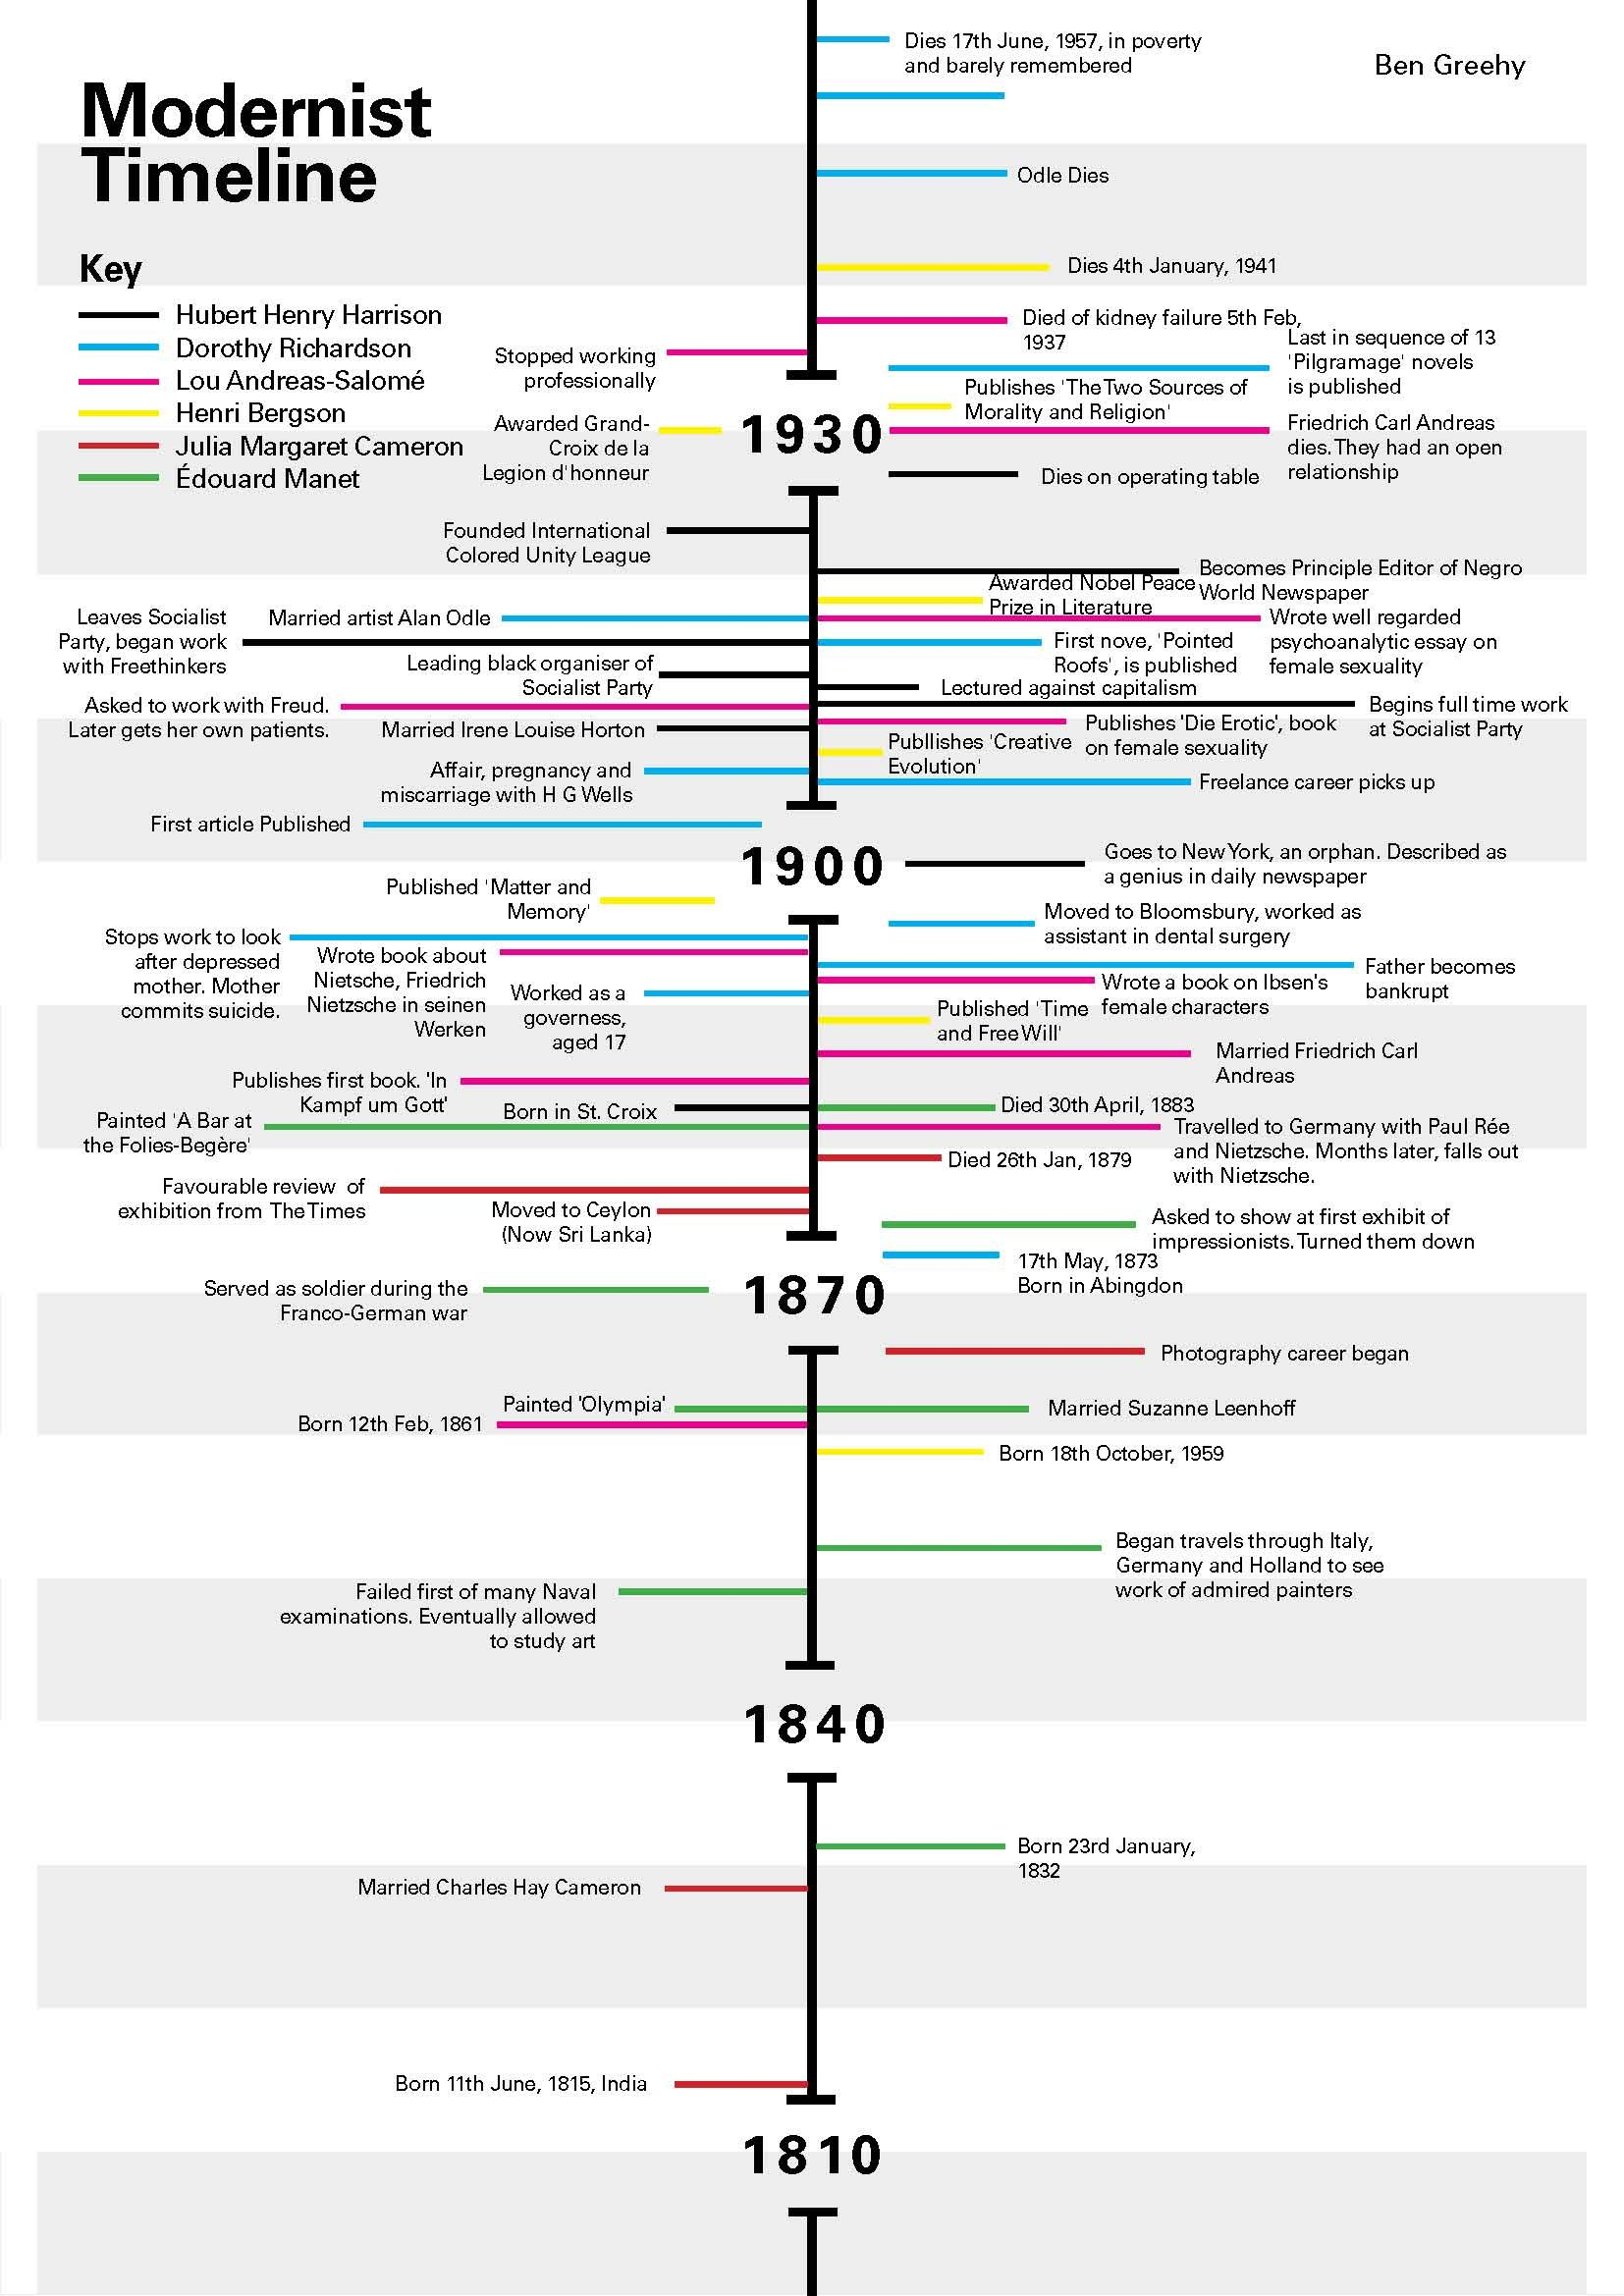 Post Modern Art Timeline